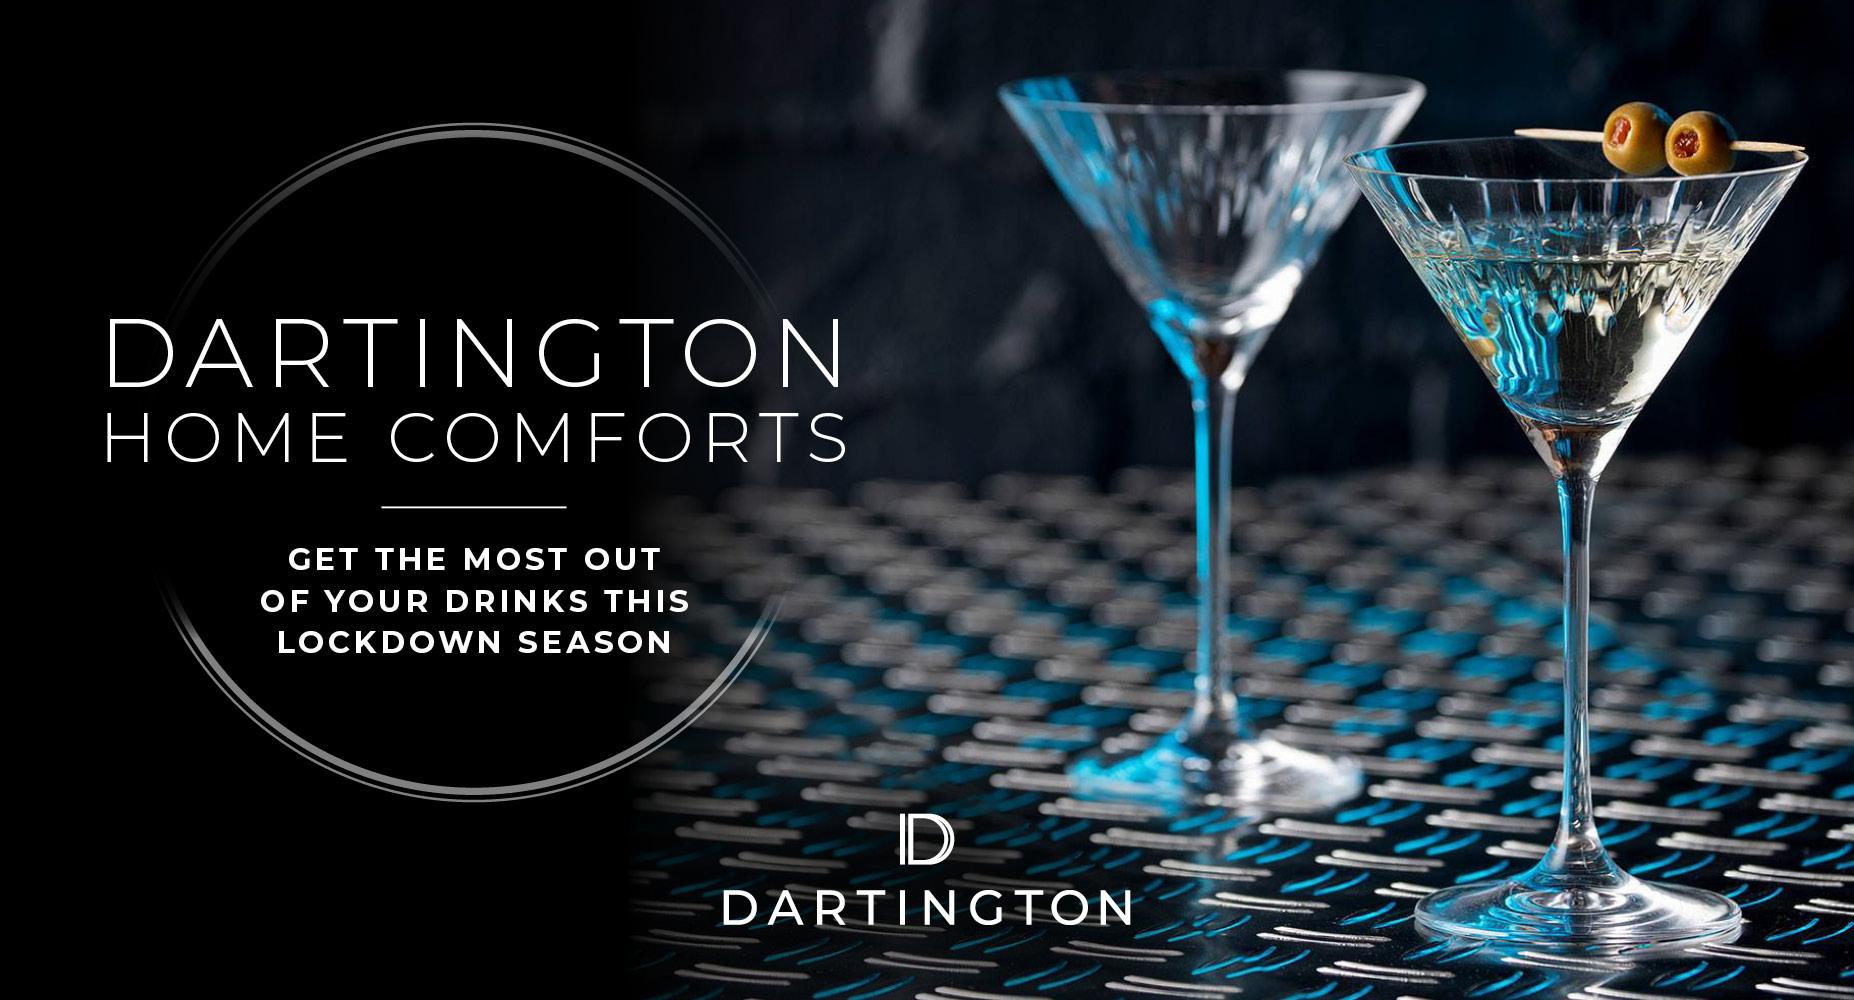 Dartington Home Comforts